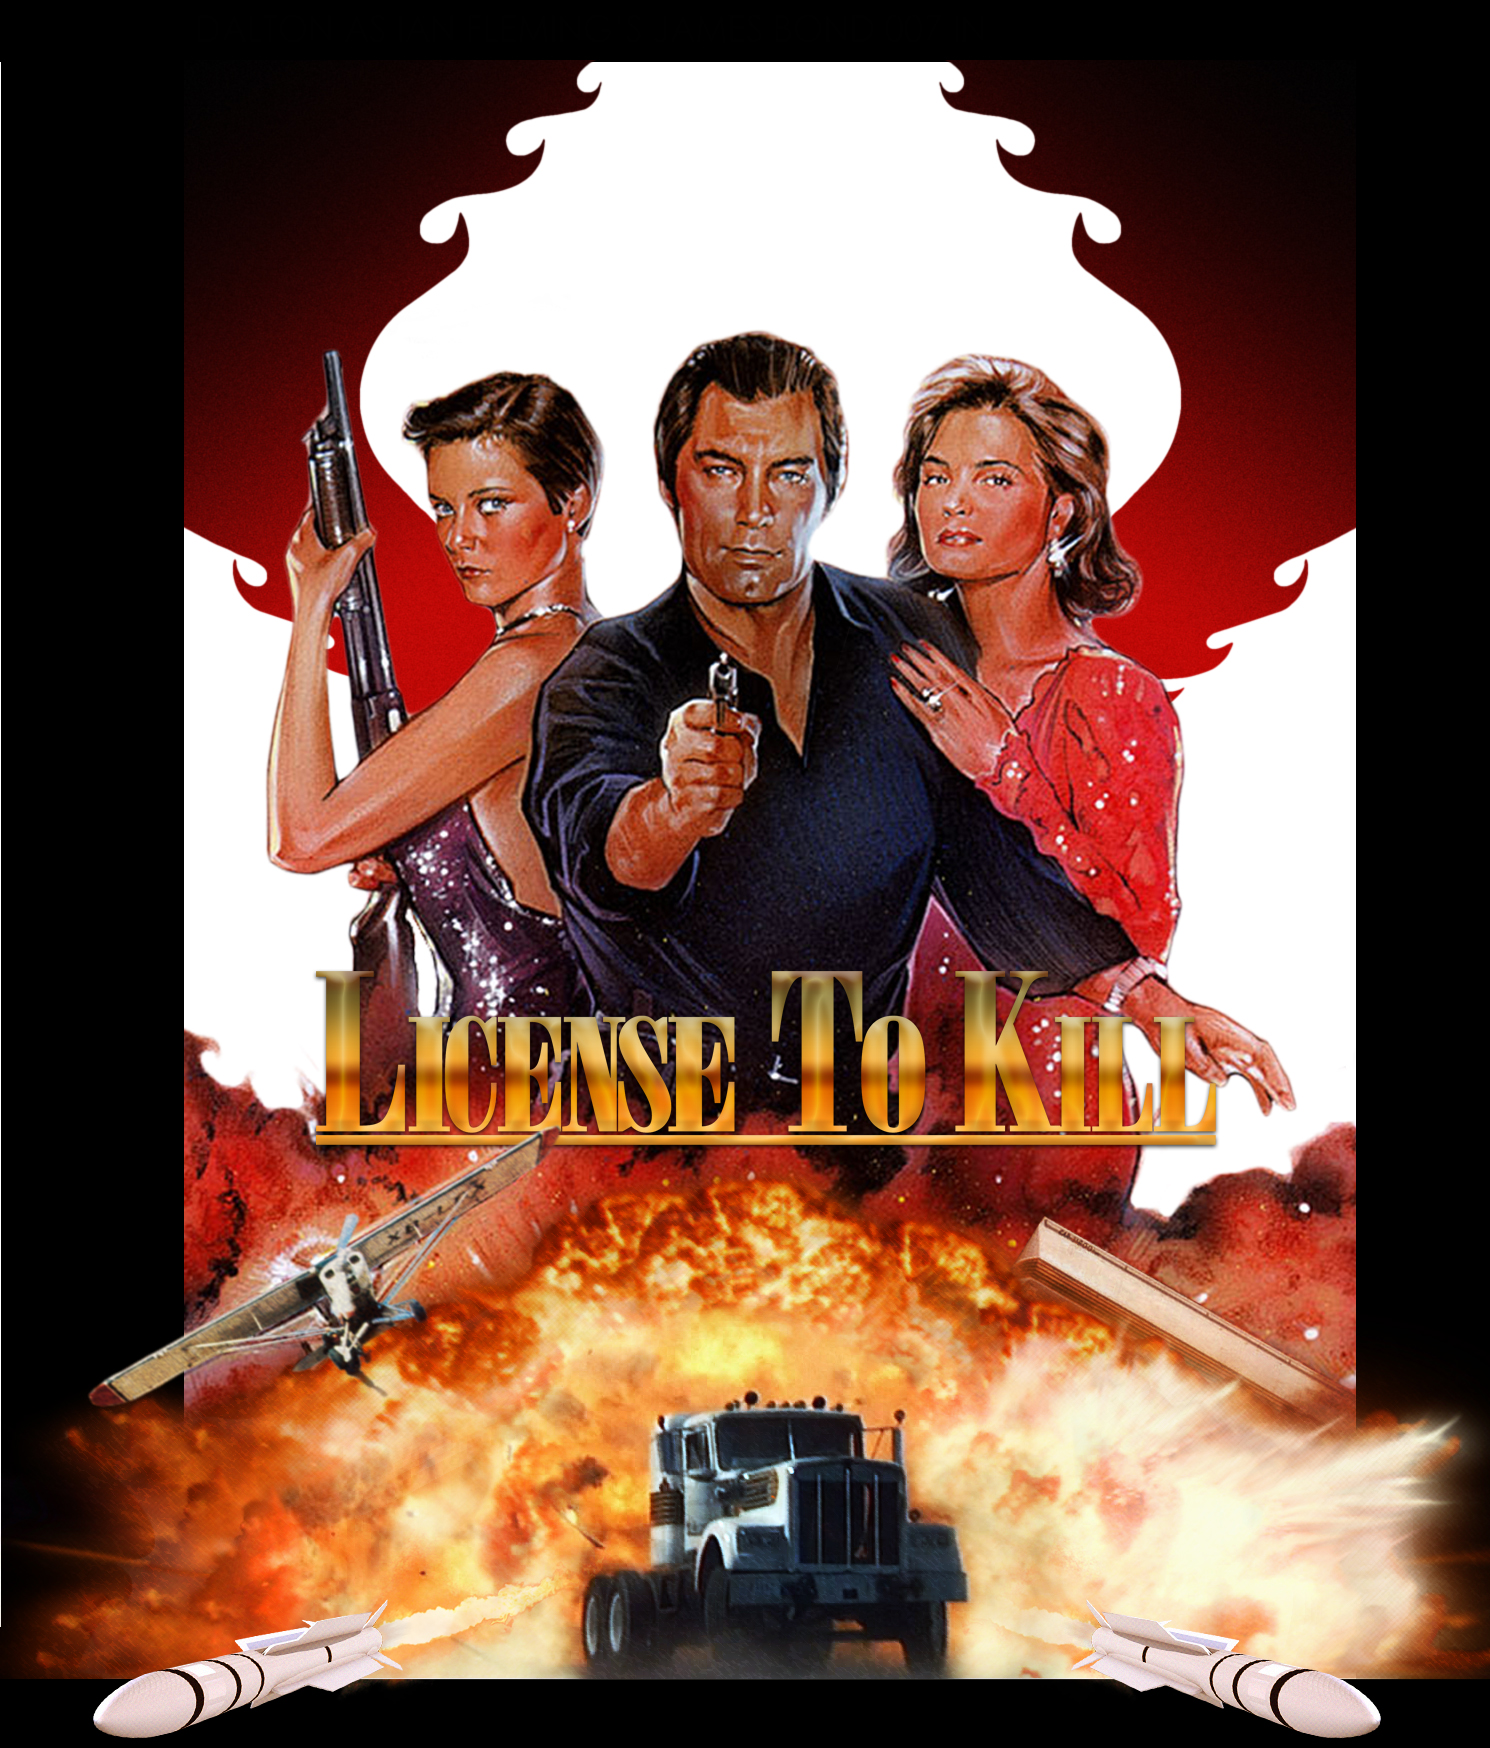 License To Kill by Trekkie313